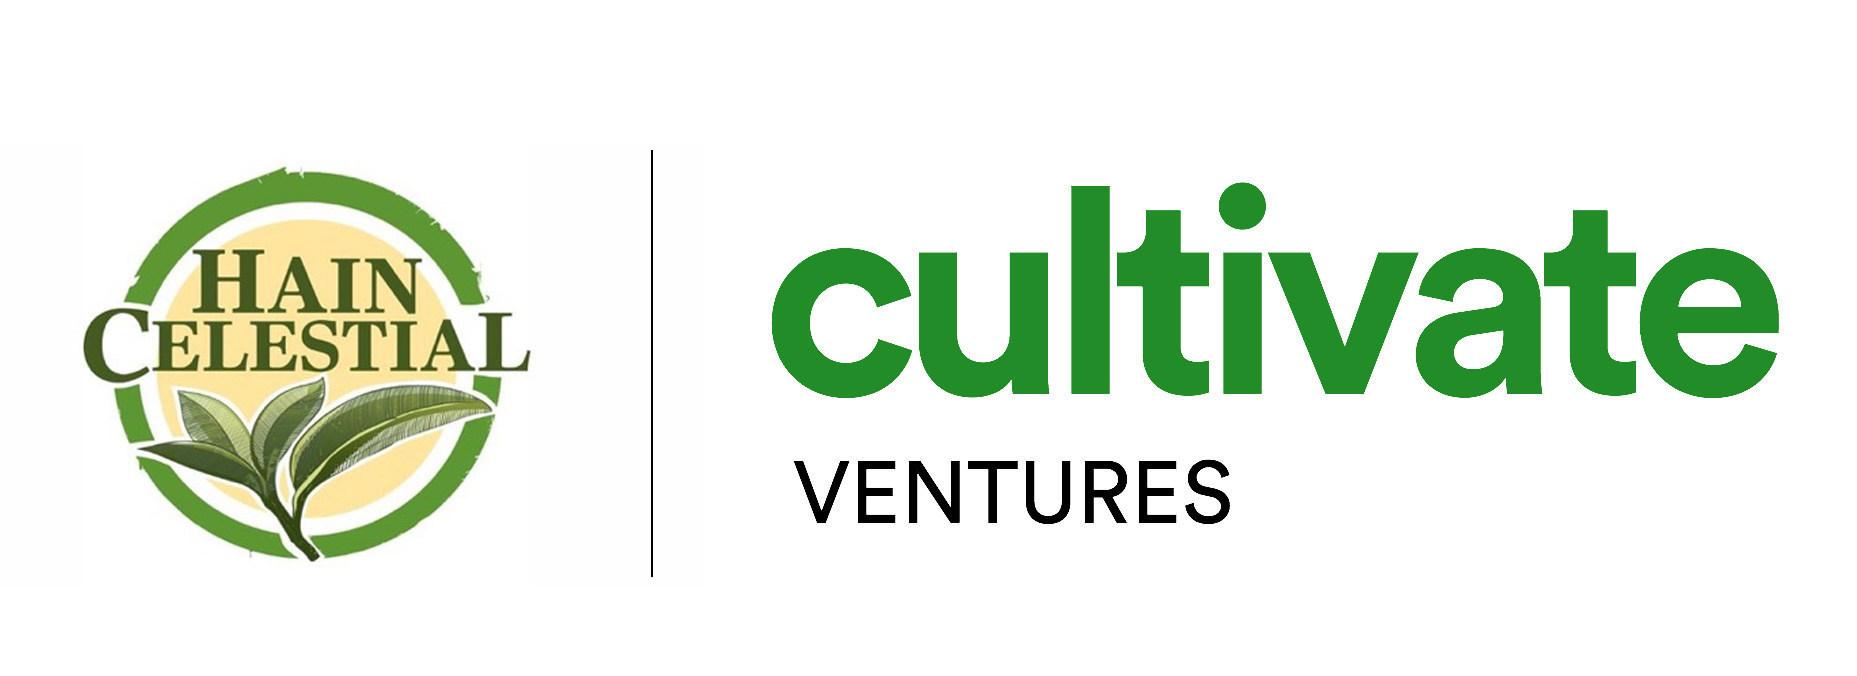 Hain Celestial Cultivate Ventures Logo